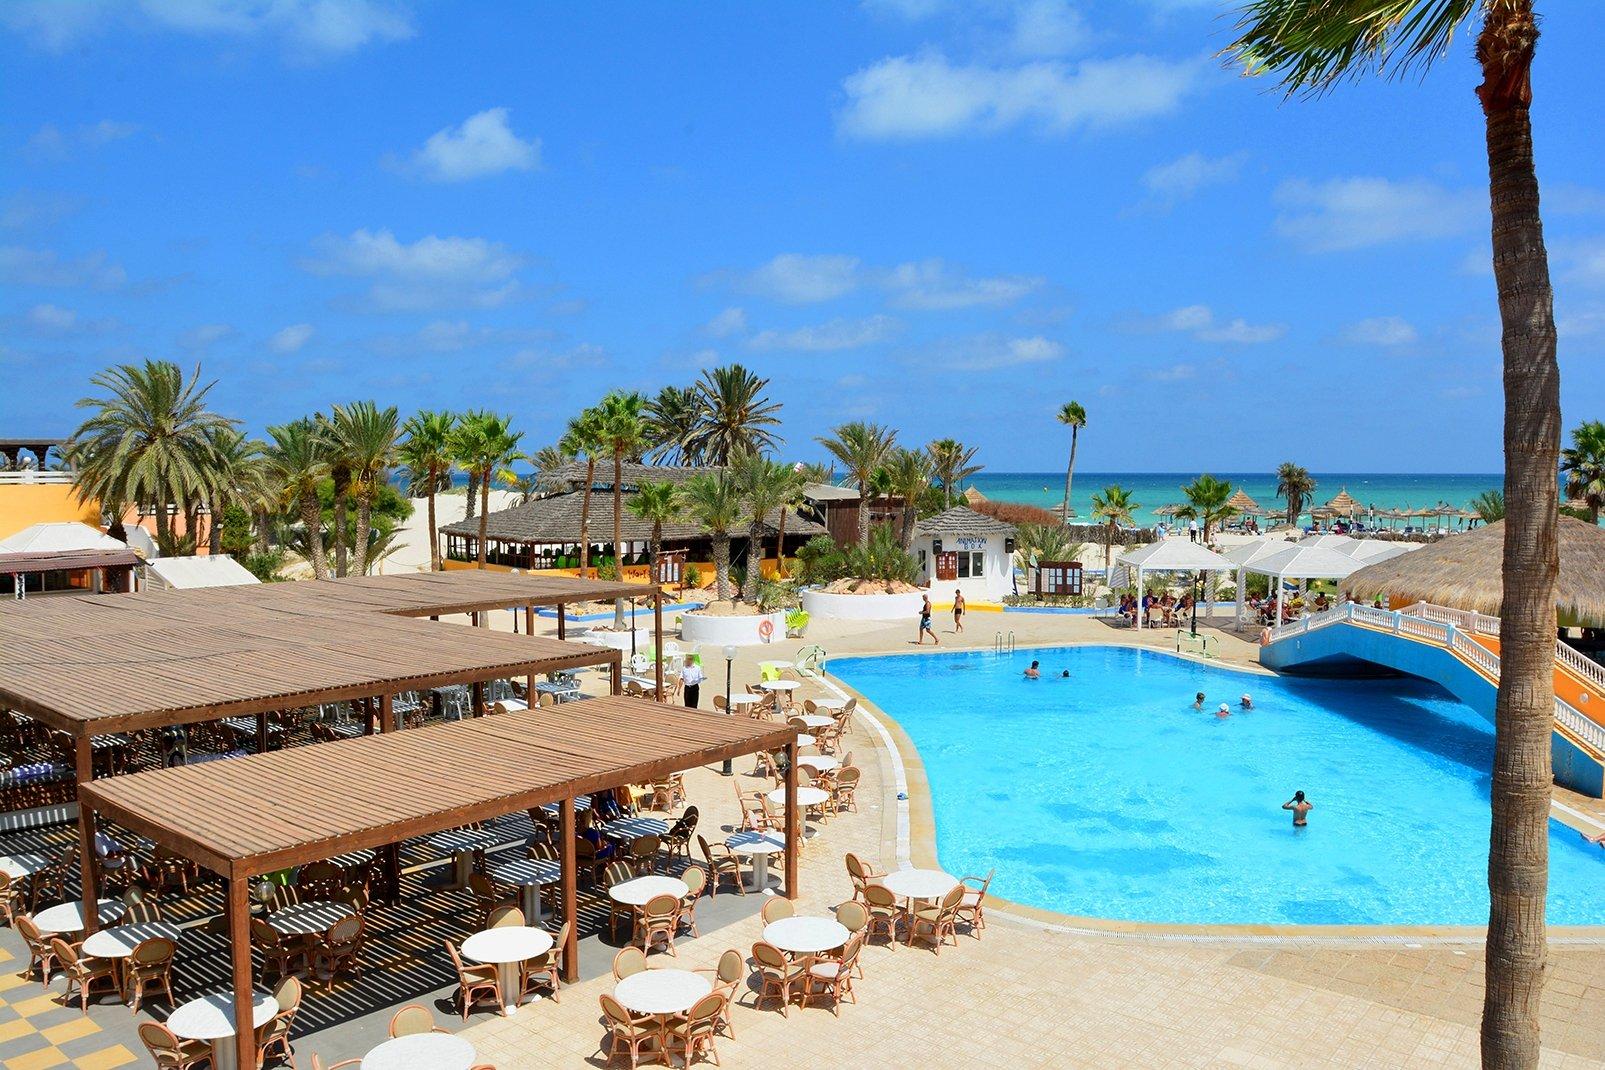 Club Lookéa Playa Djerba 4* - Vols Réguliers - 1